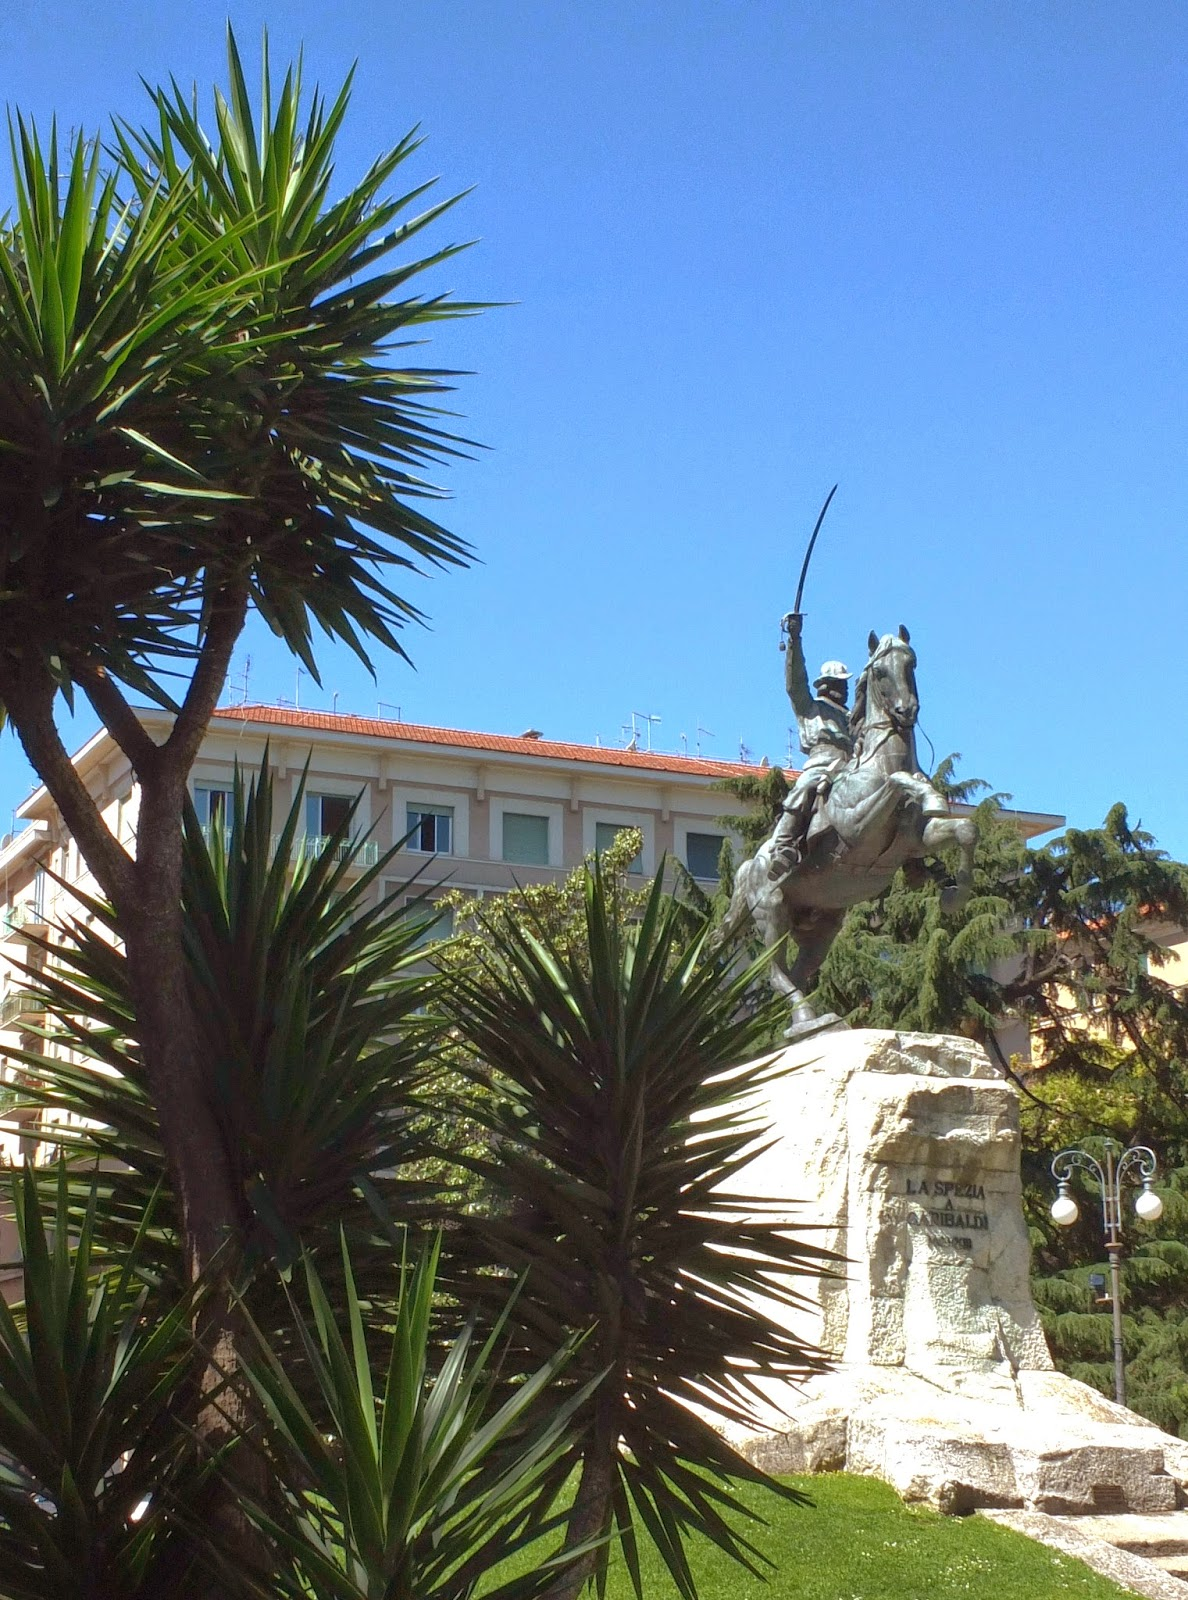 La Spezia Public Gardens & Garibaldi